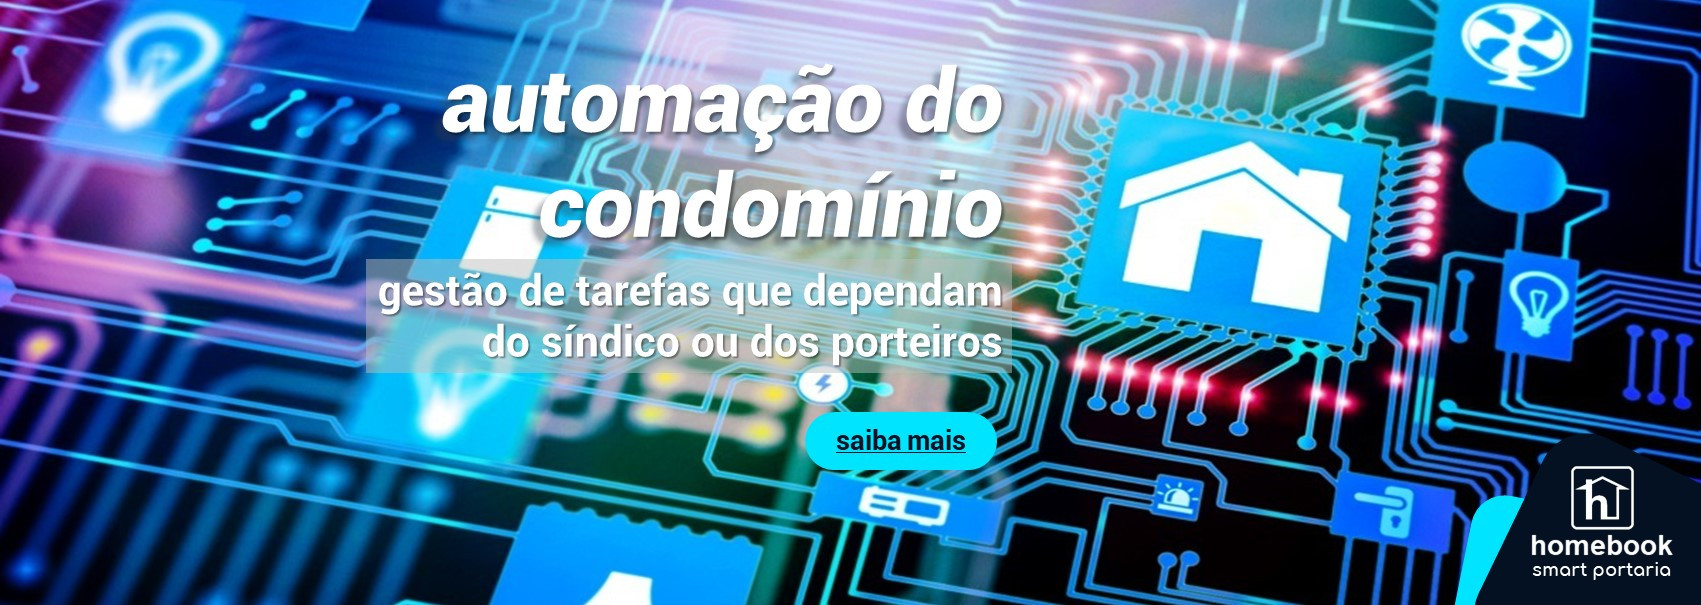 Homebook-Portaria-Remota-Robotizada-Automacao-Condominial-motores-bombas-dagua-iluminacao-arcondicionado